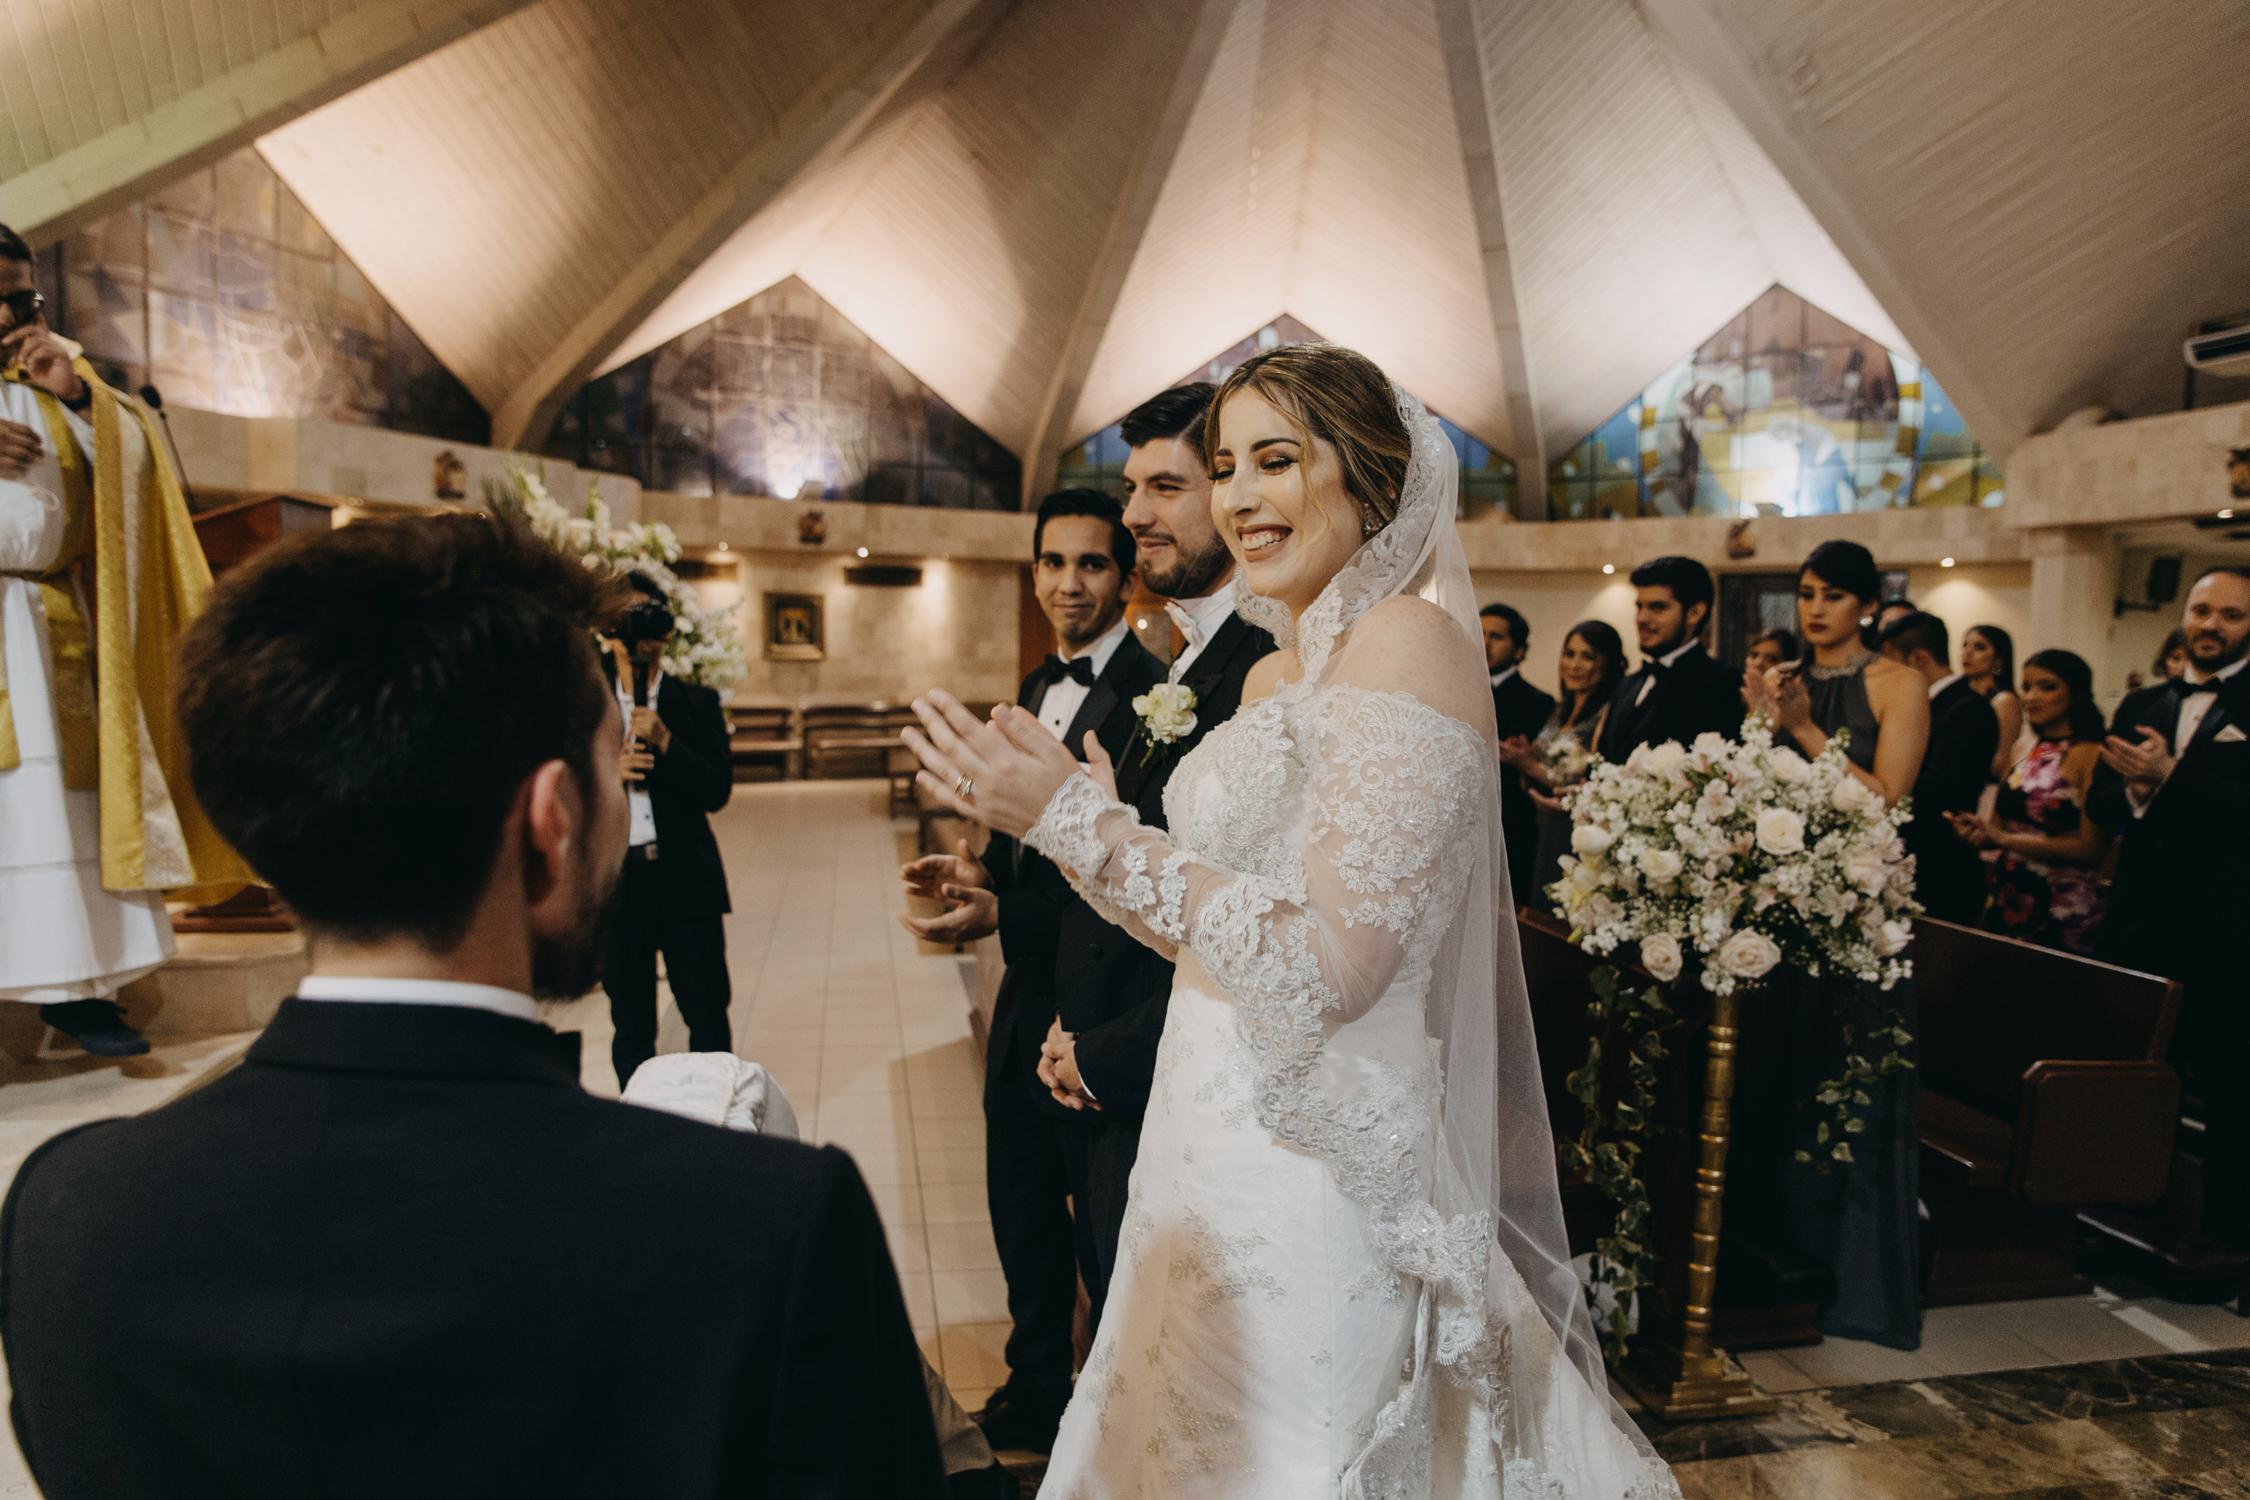 Michelle-Agurto-Fotografia-Bodas-Ecuador-Destination-Wedding-Photographer-Vicky-Javier-95.JPG